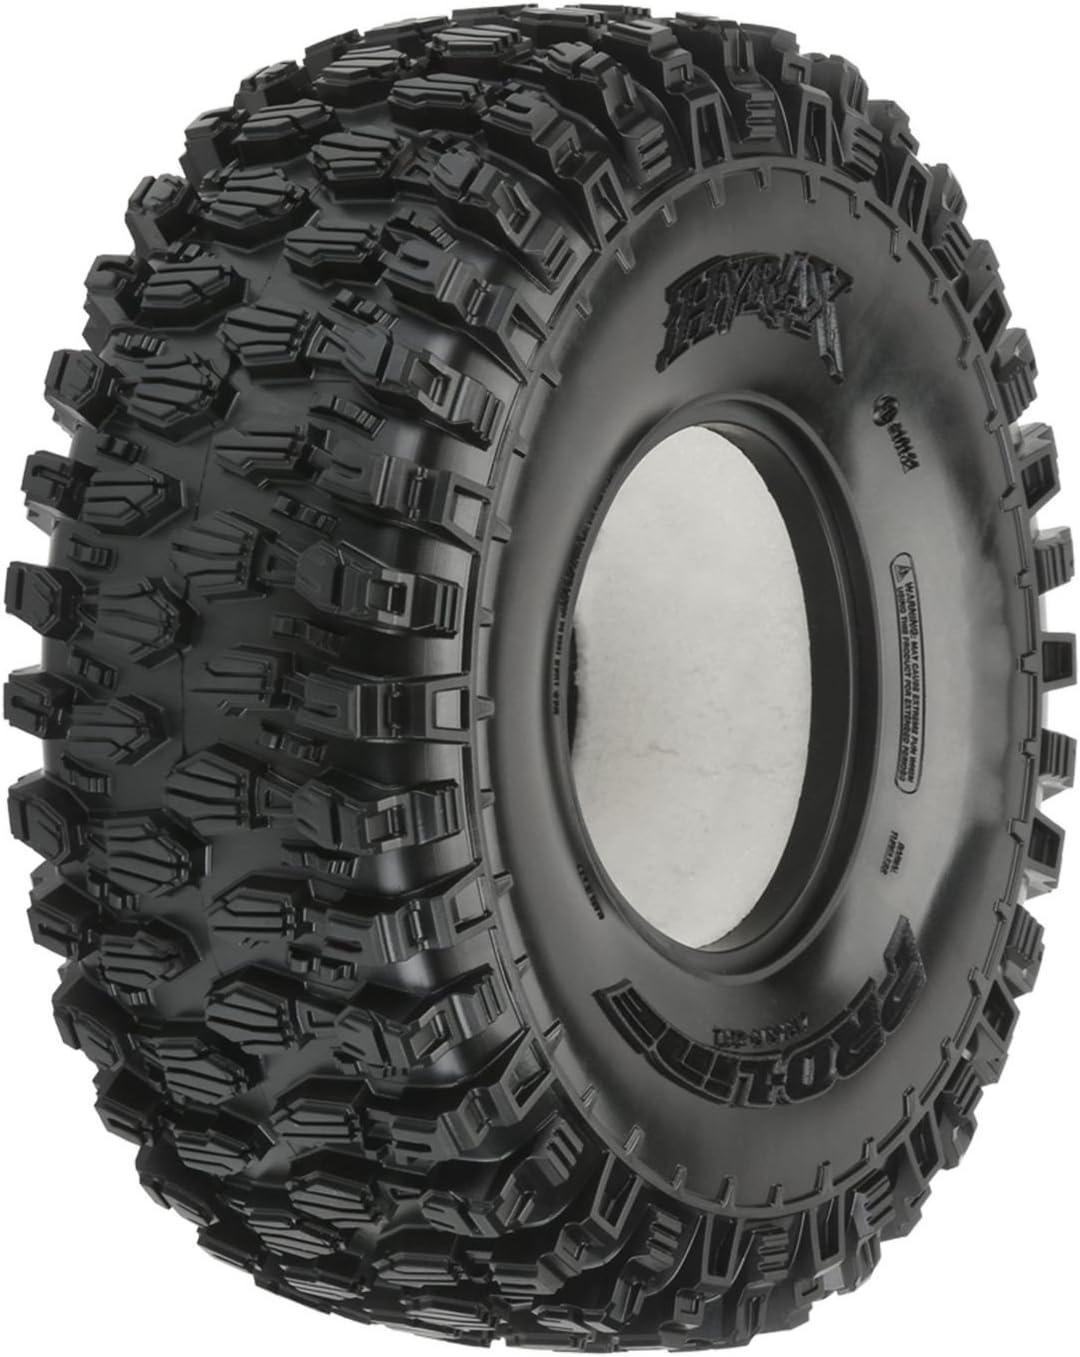 Proline 1013214 Hyrax 2G8 Rock Terrain Truck Tires (2)